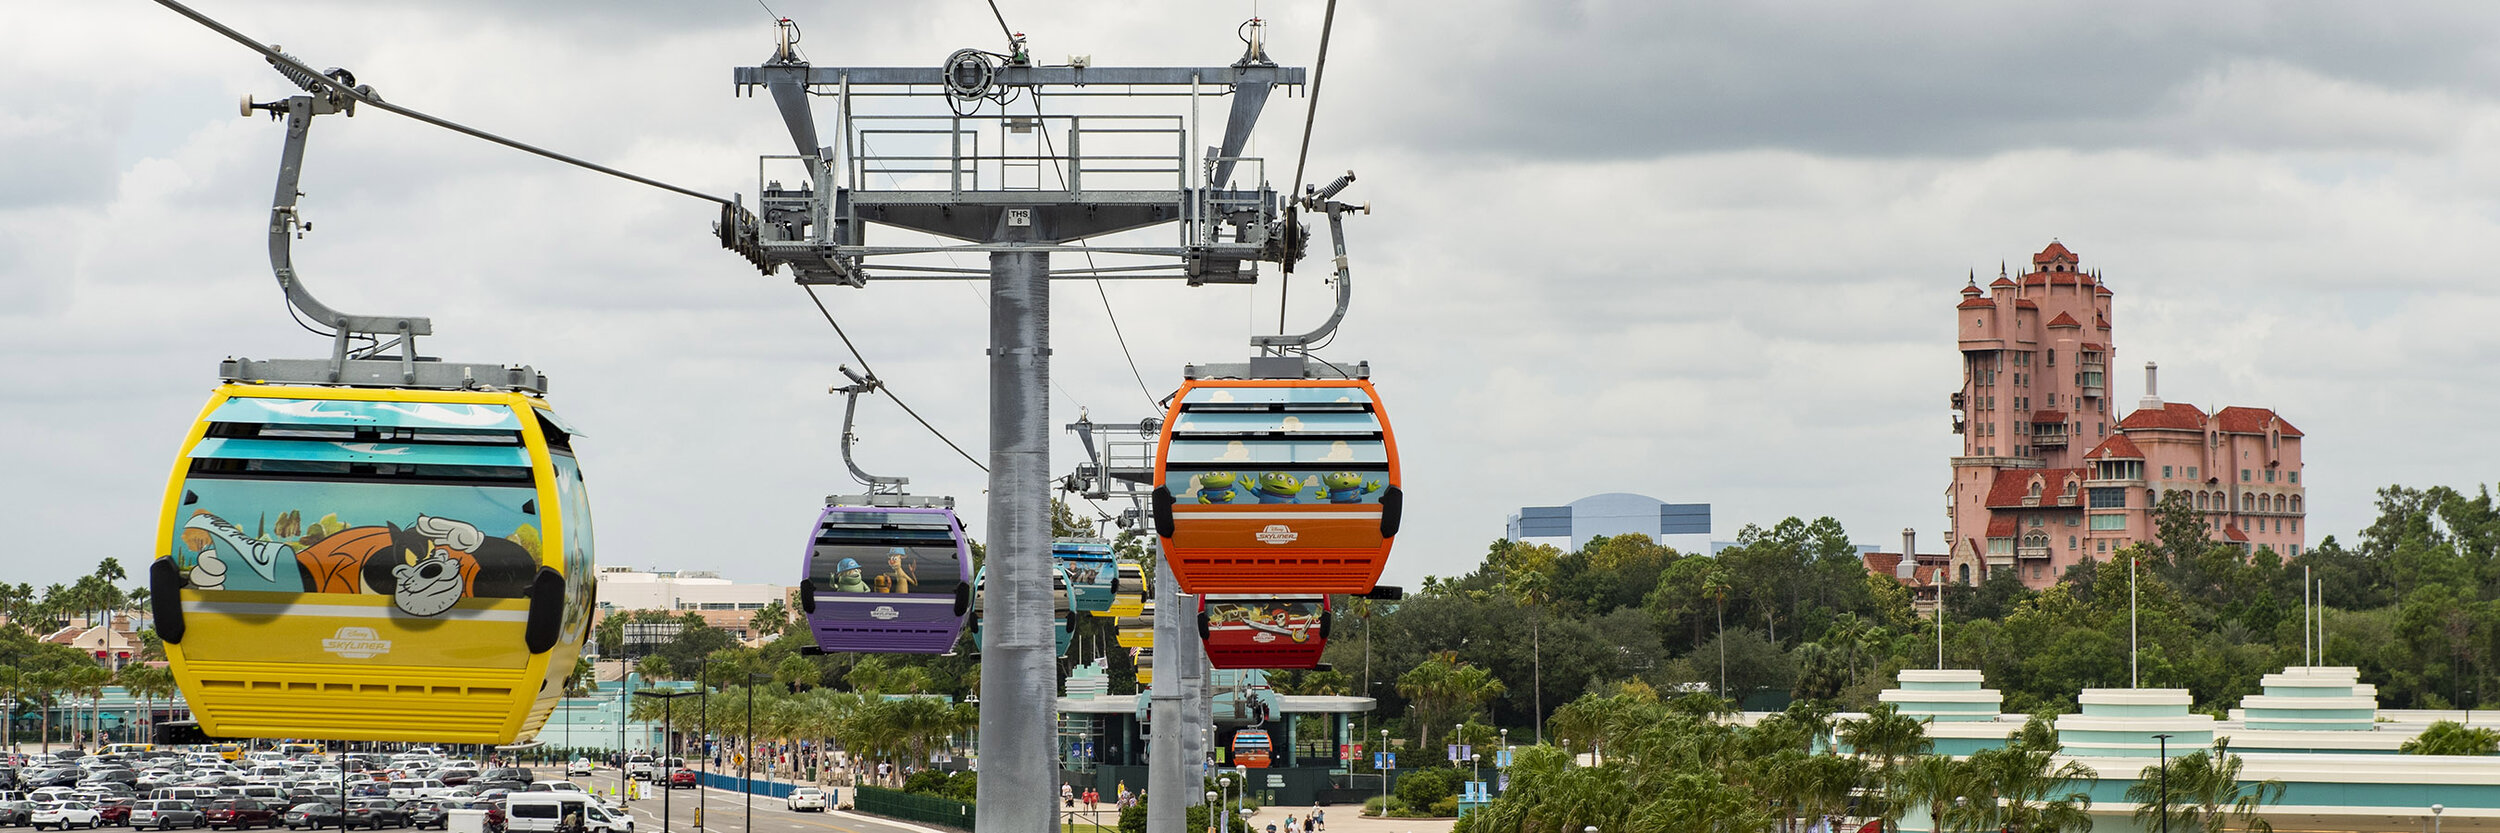 Disney Skyliner System at the Walt Disney World Resort in Florida